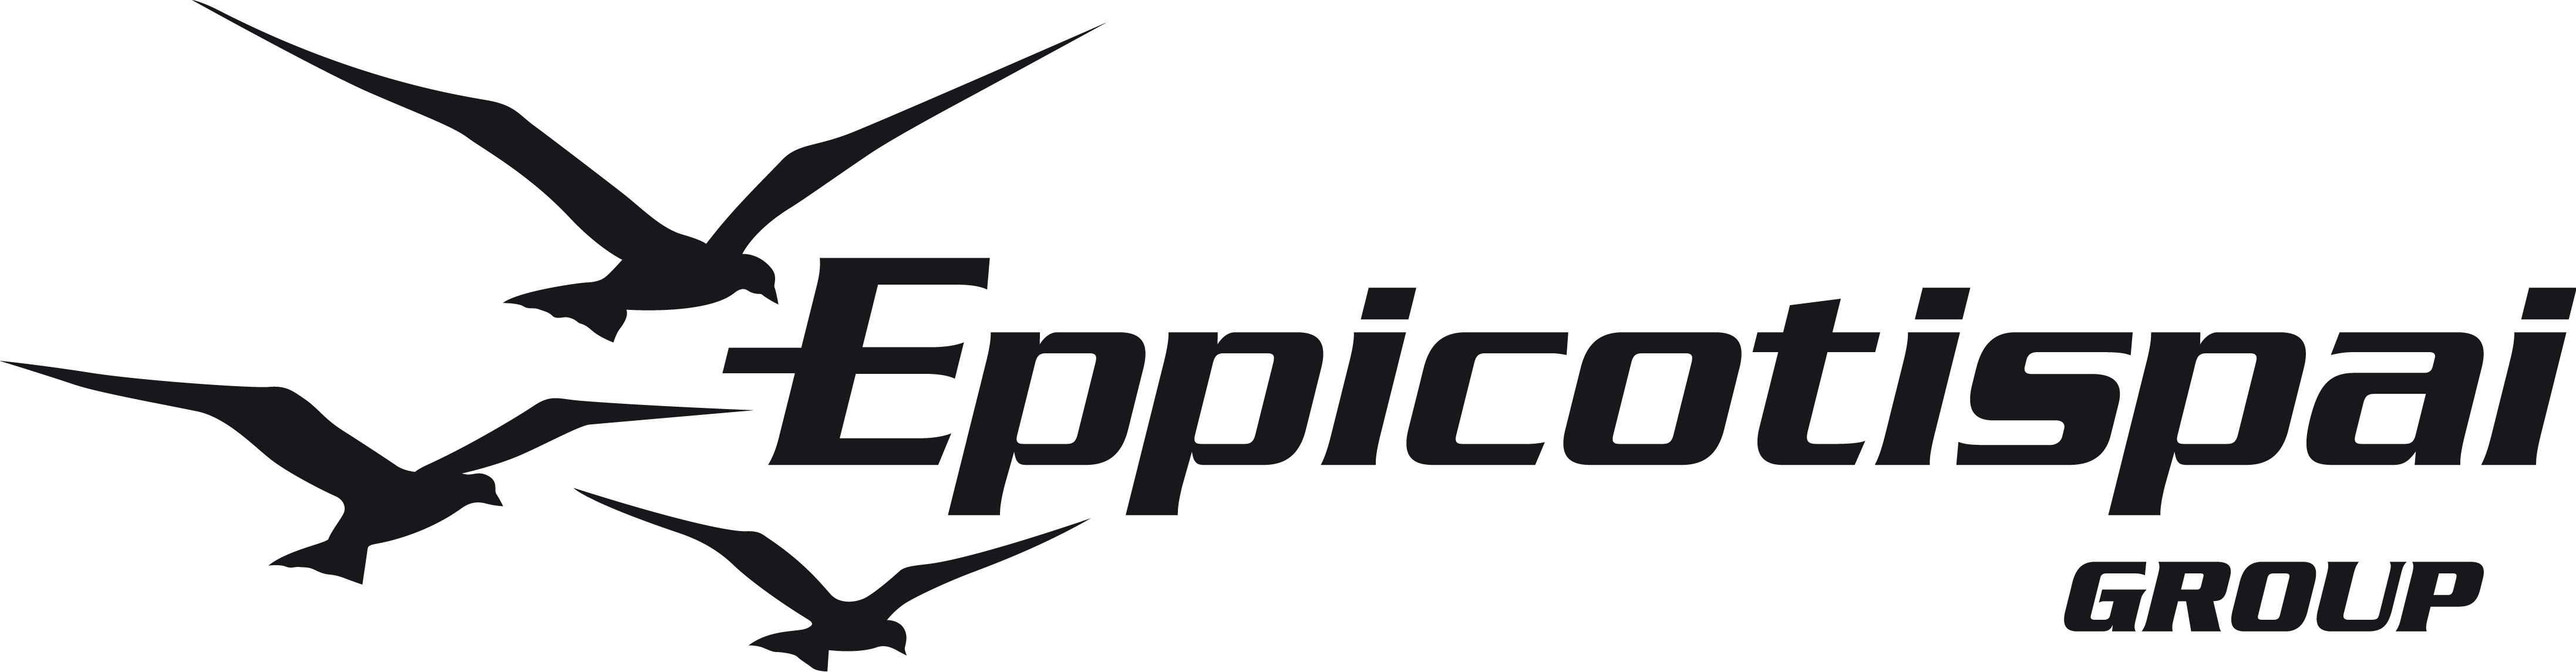 logo_EPPICOTISPAI